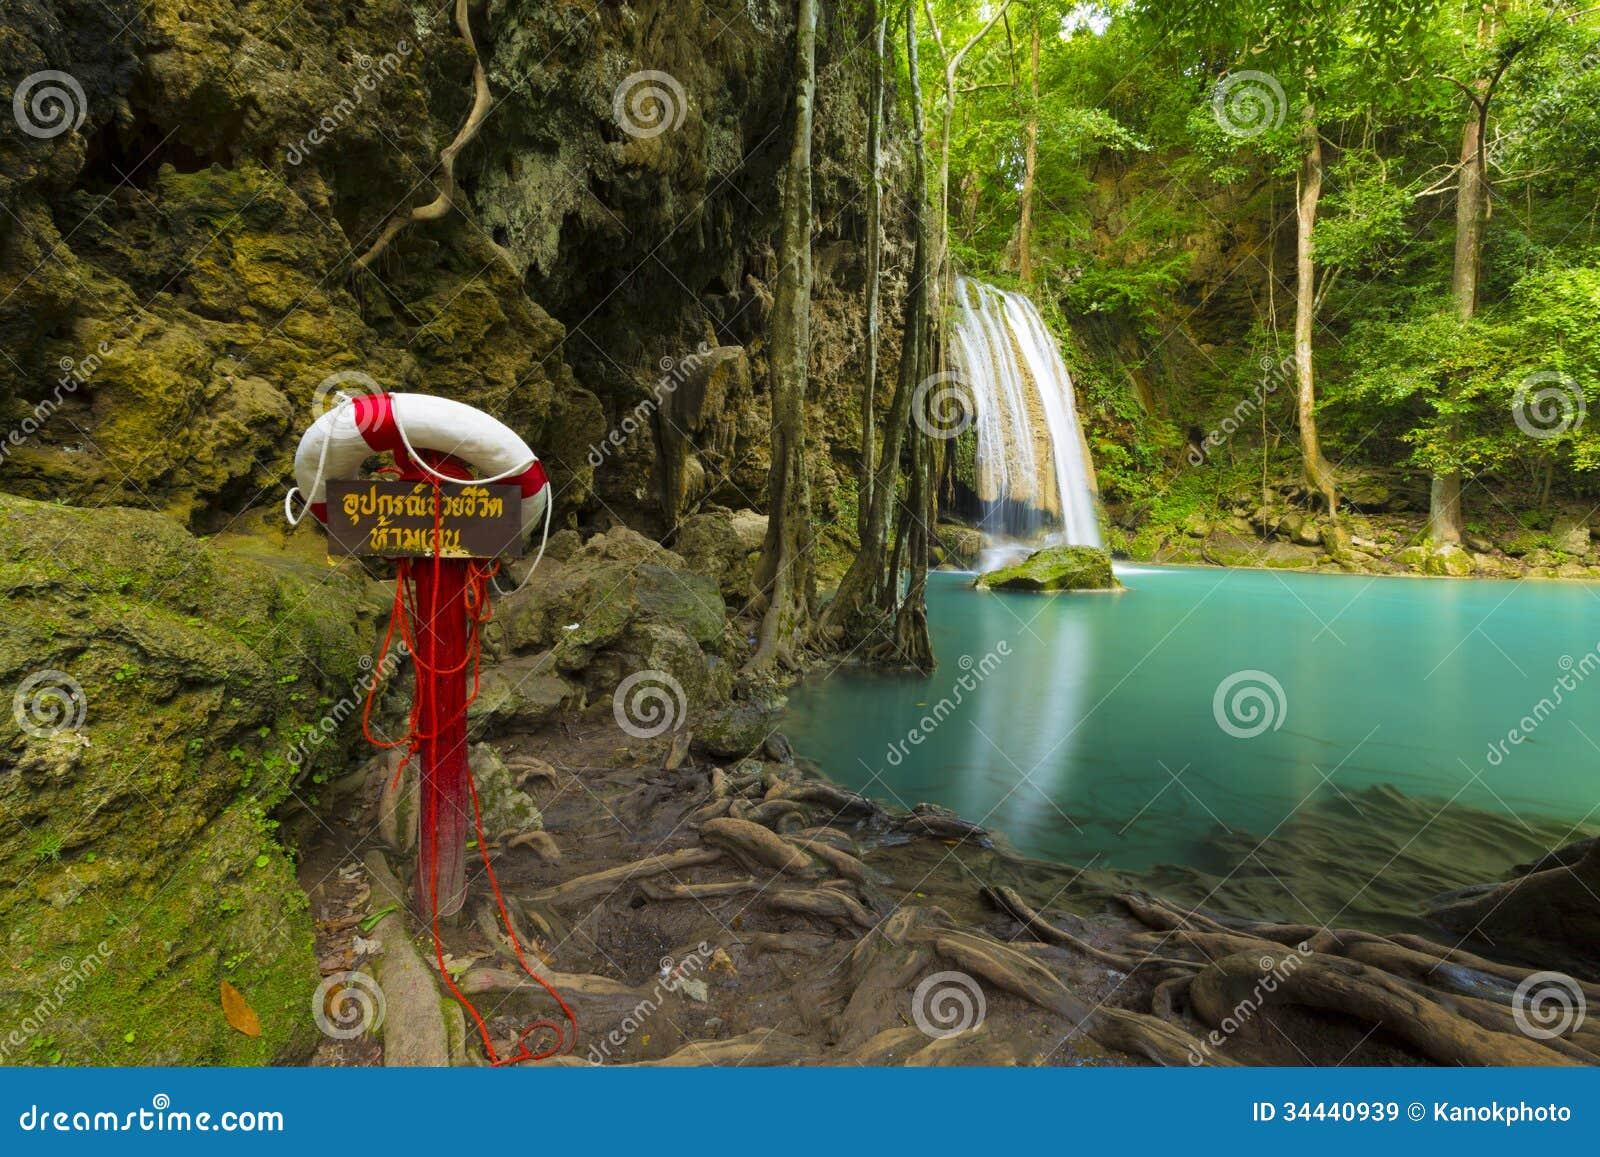 Beautiful waterfall in thailand s erawan waterfalls national park - 3d Tropical Rainforest Waterfall Hot Girls Wallpaper